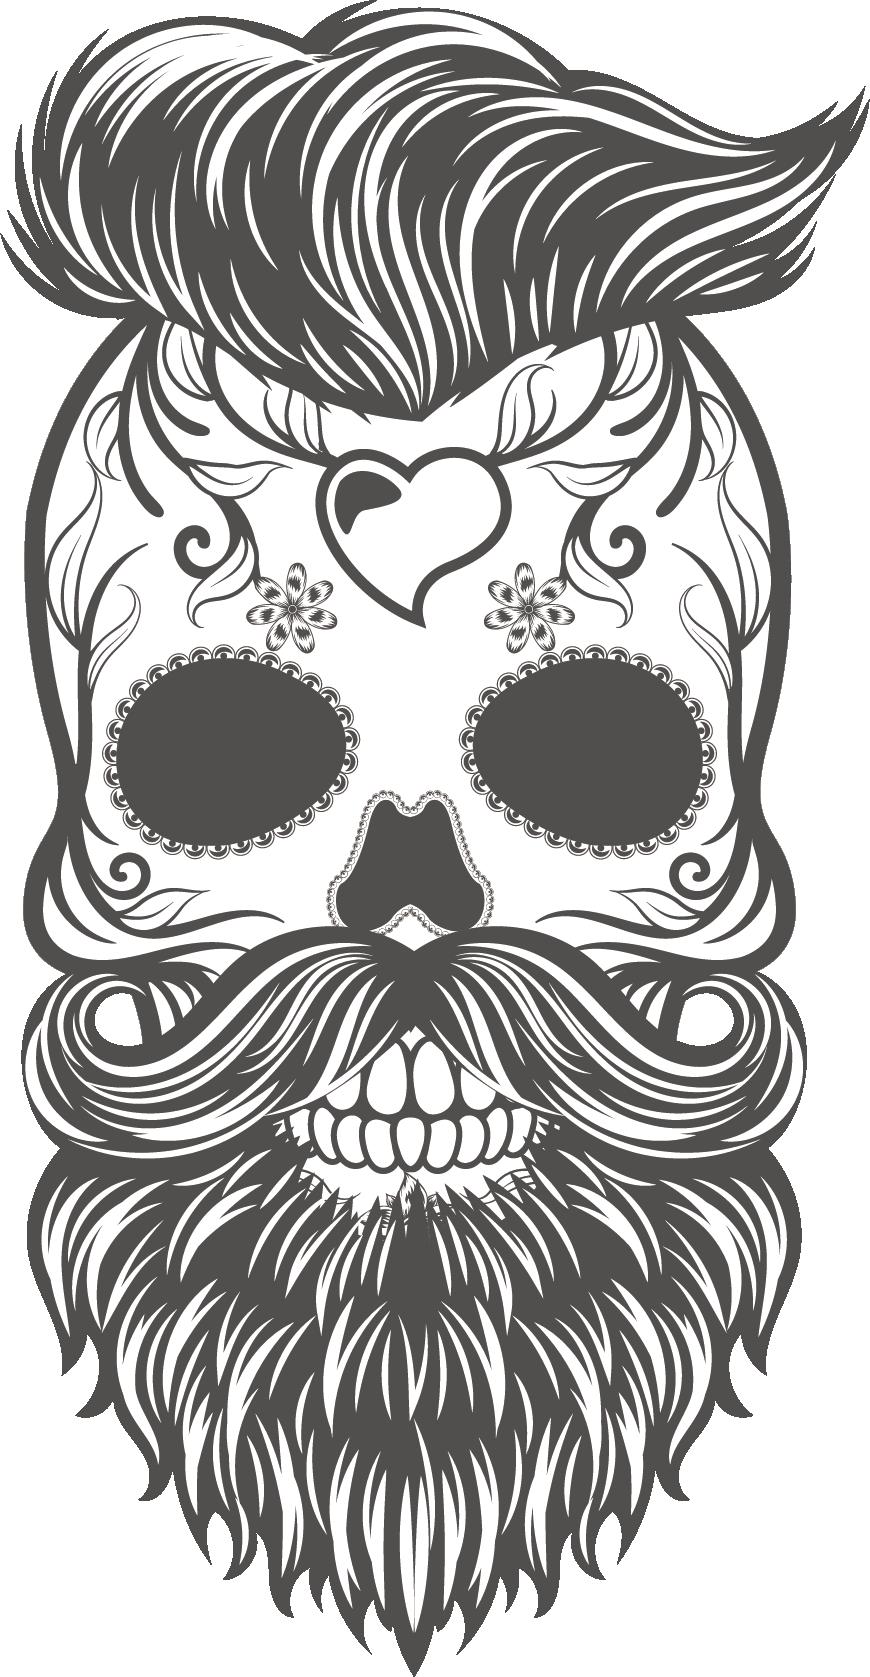 Transparent sugar skull clipart black and white - And Skull Painted Calavera Sticker Hand Vector Clipart - Beard Skull Vector Png